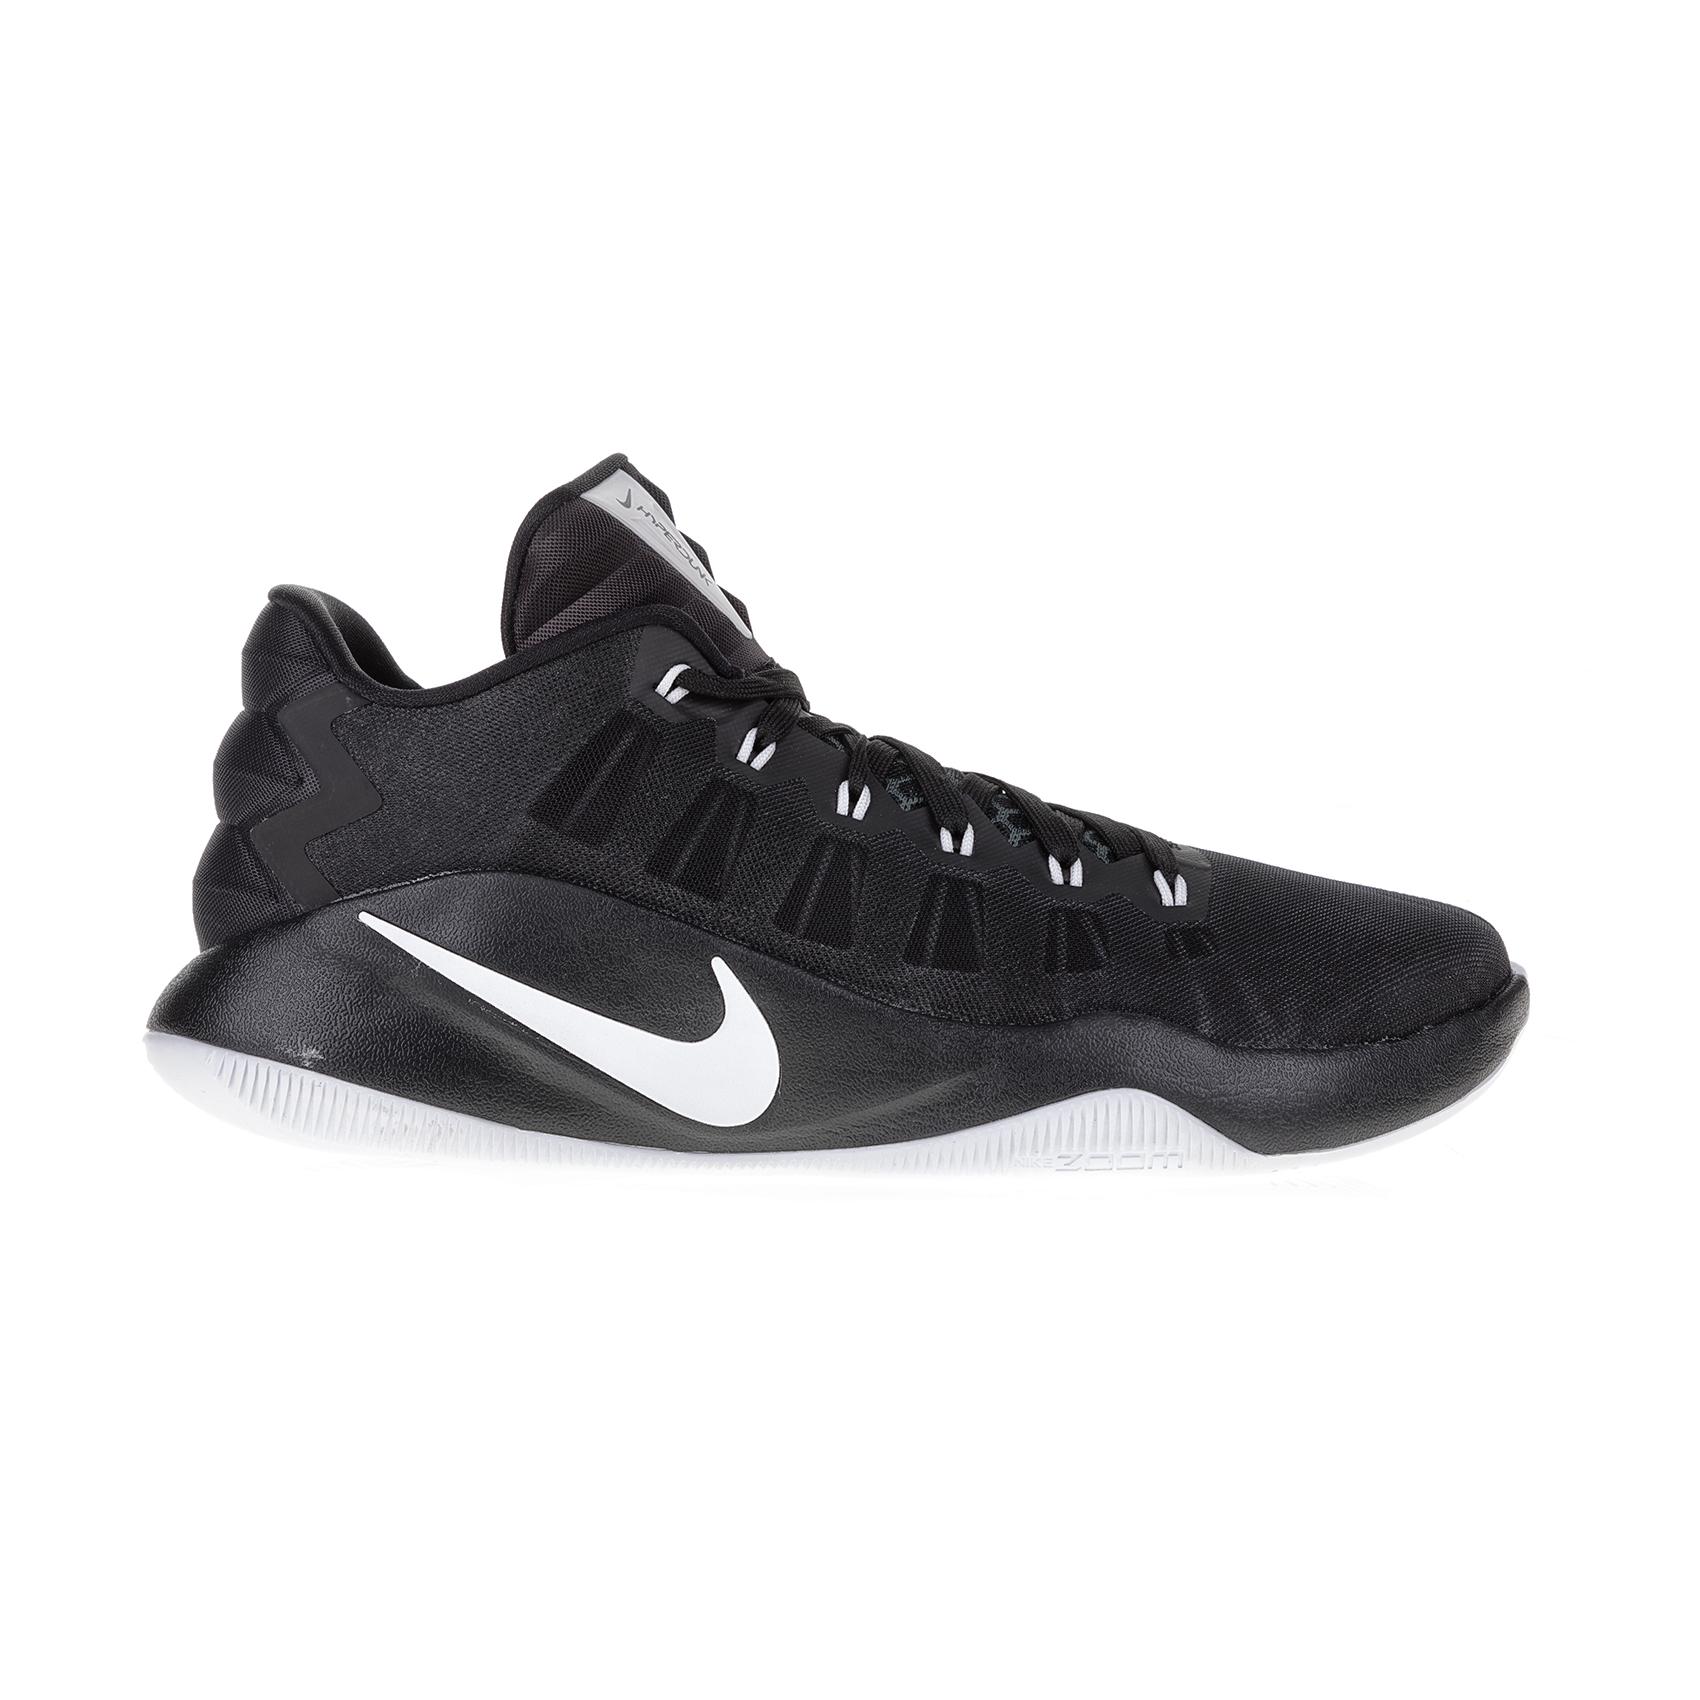 NIKE - Ανδρικά παπούτσια μπάσκετ NIKE HYPERDUNK 2016 LOW μαύρα